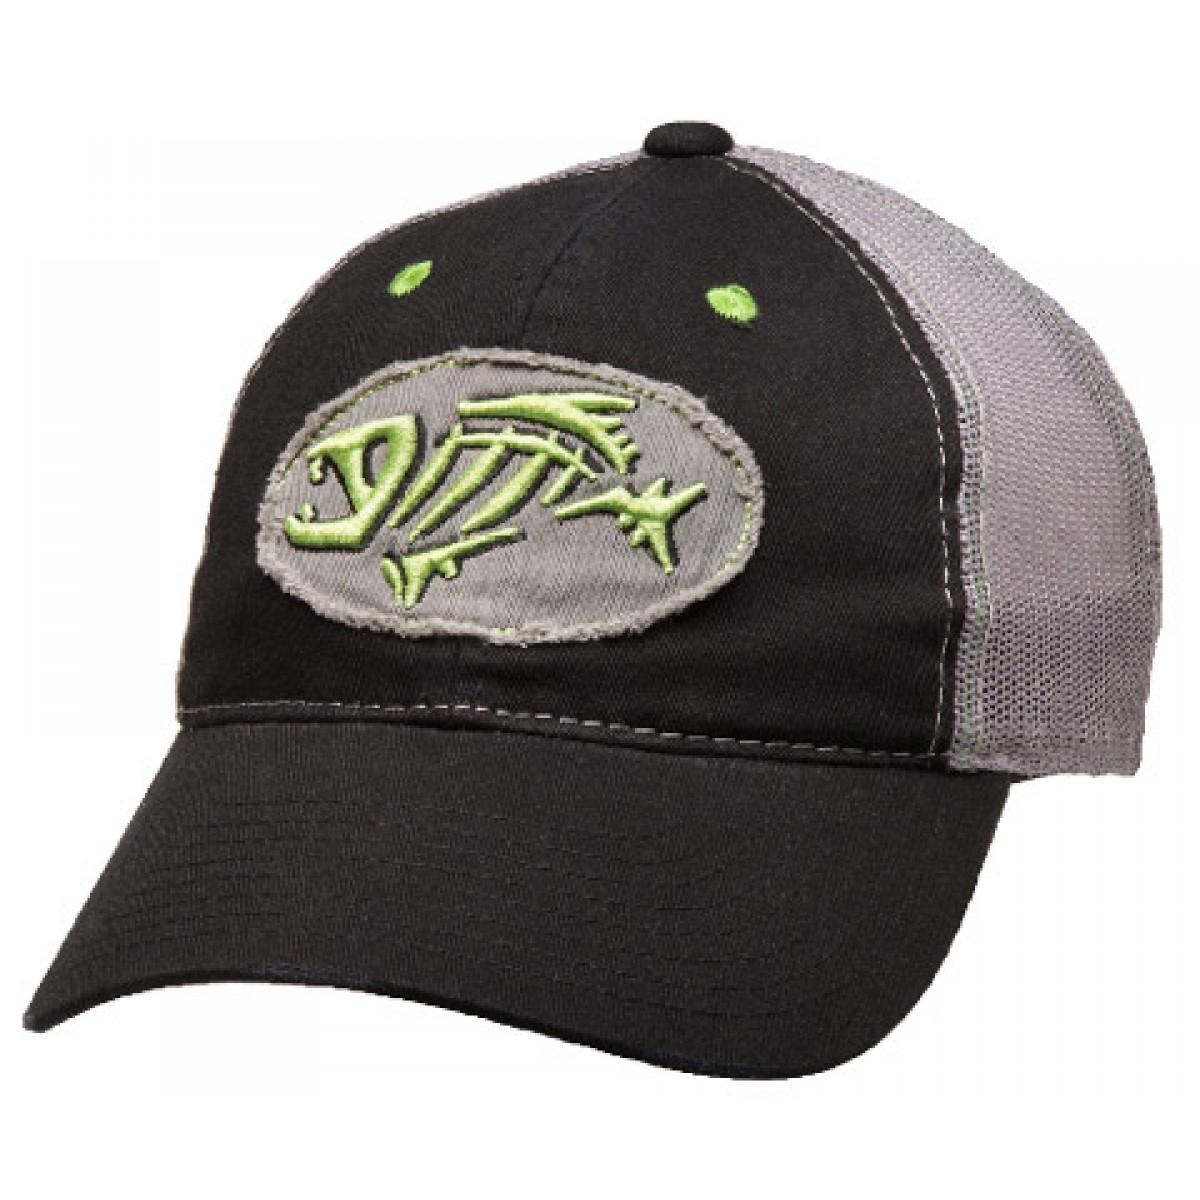 6d19bdc2453 G Loomis Hats and Visors